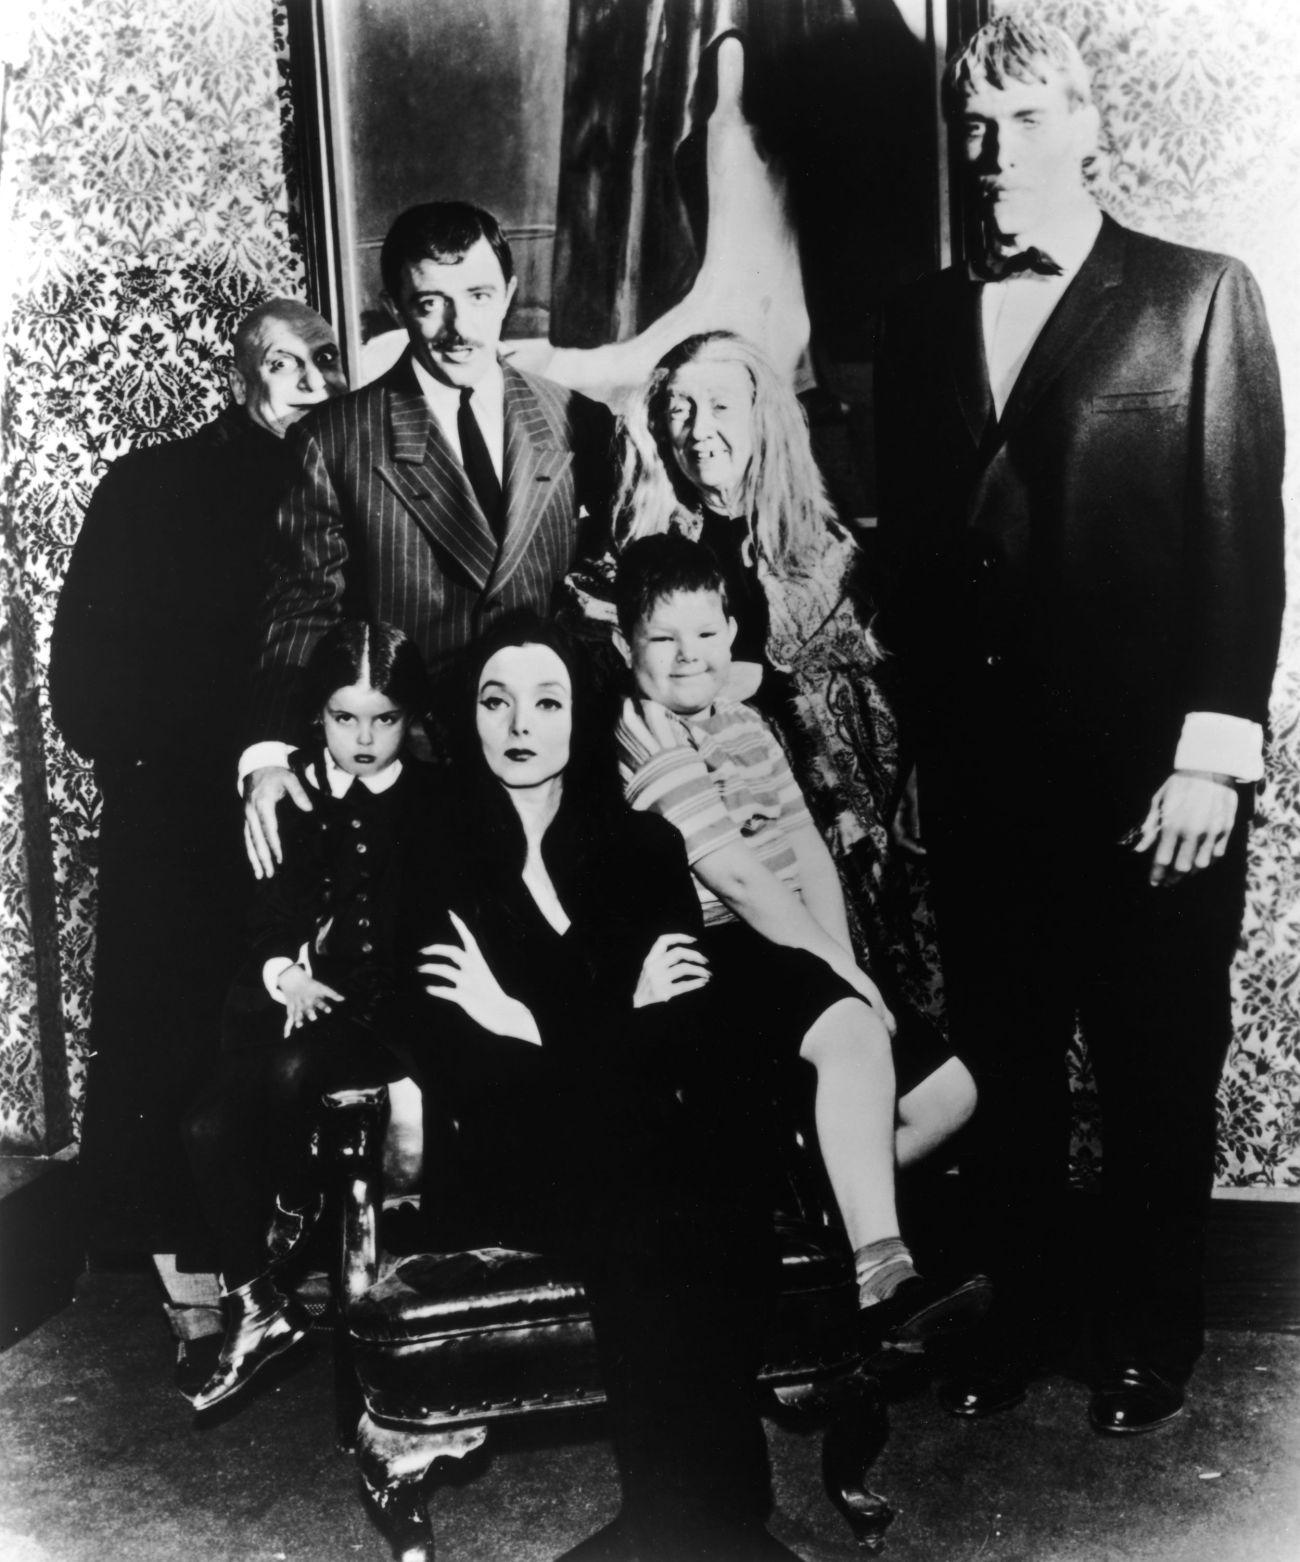 El elenco de la serie The Addams Family (1964-1966). Imagen: pinterest.com